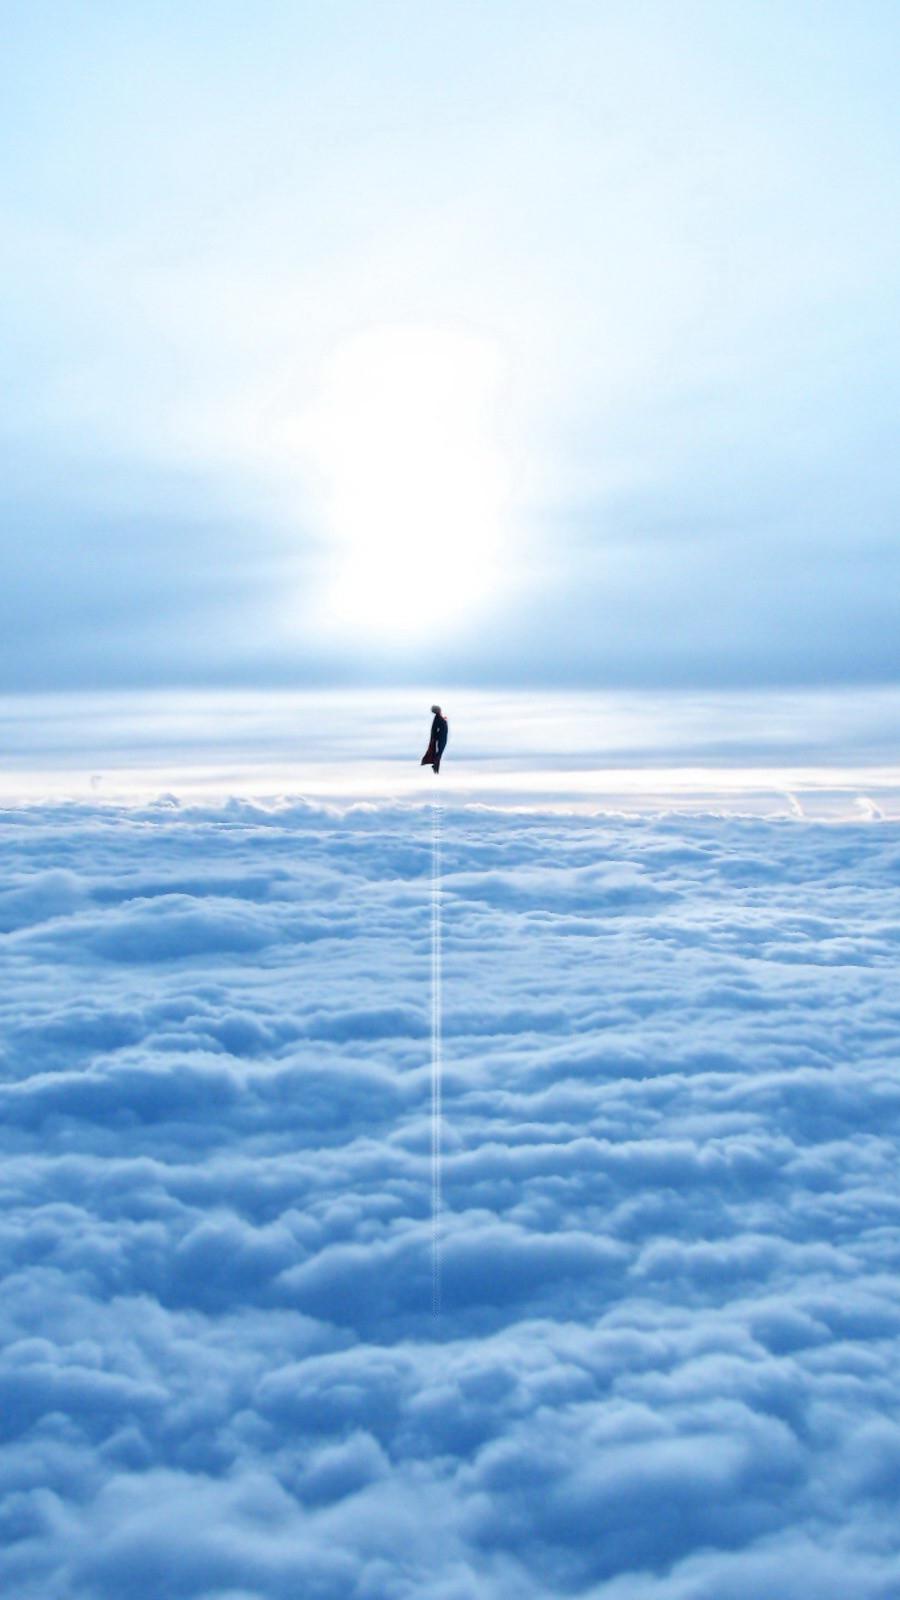 Superman In Sky Iphone Wallpaper Iphone Wallpapers